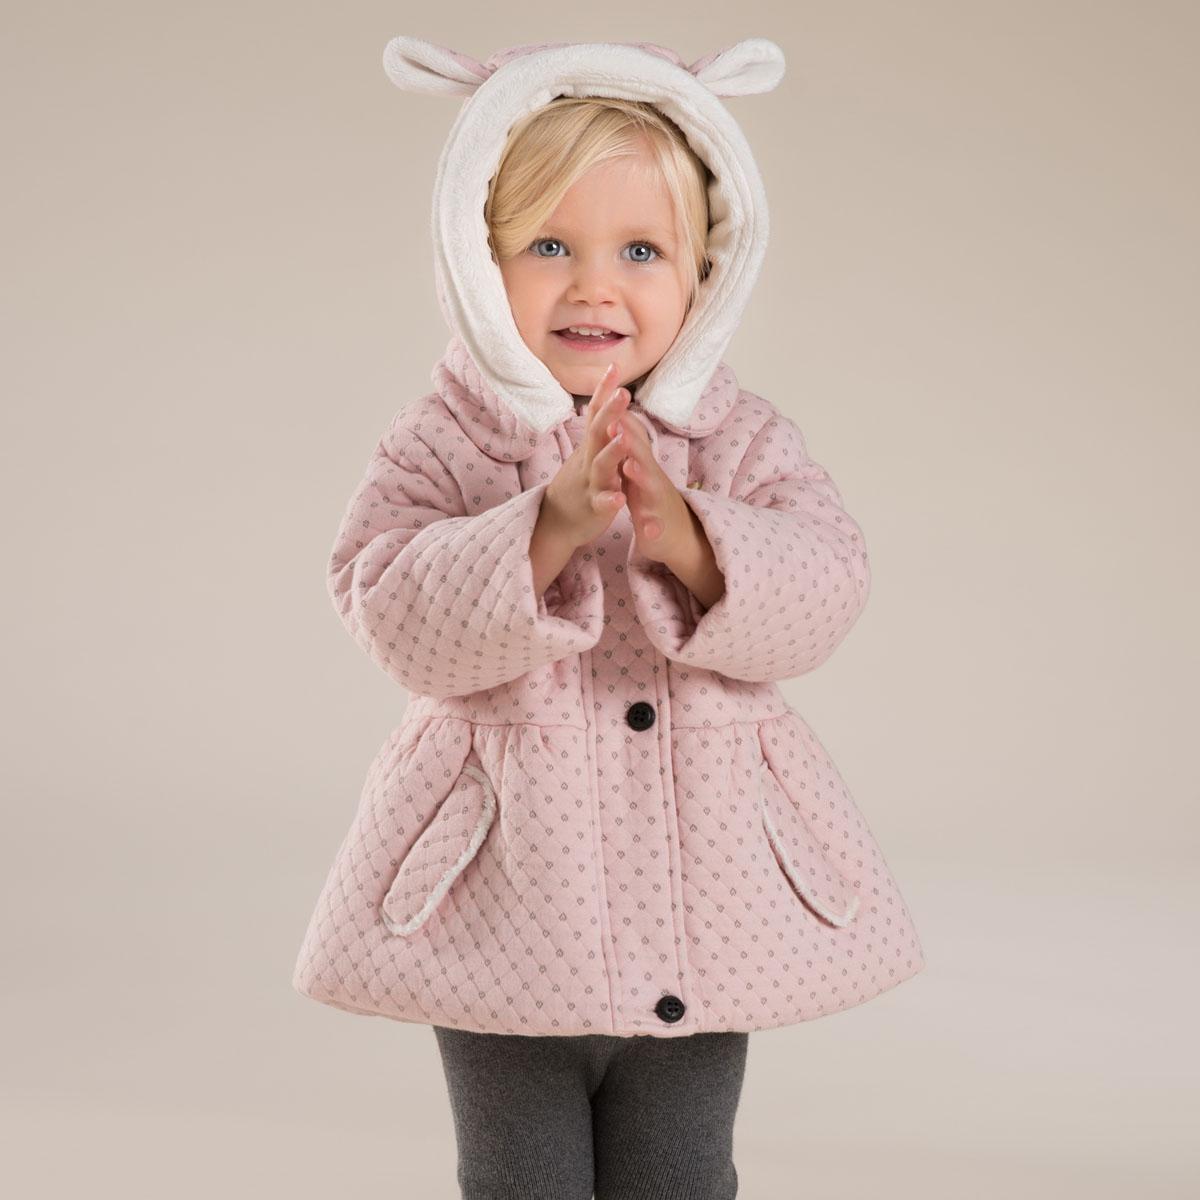 davebella戴維貝拉 女童 加厚棉服 女寶寶保暖棉衣 可脫帽CC